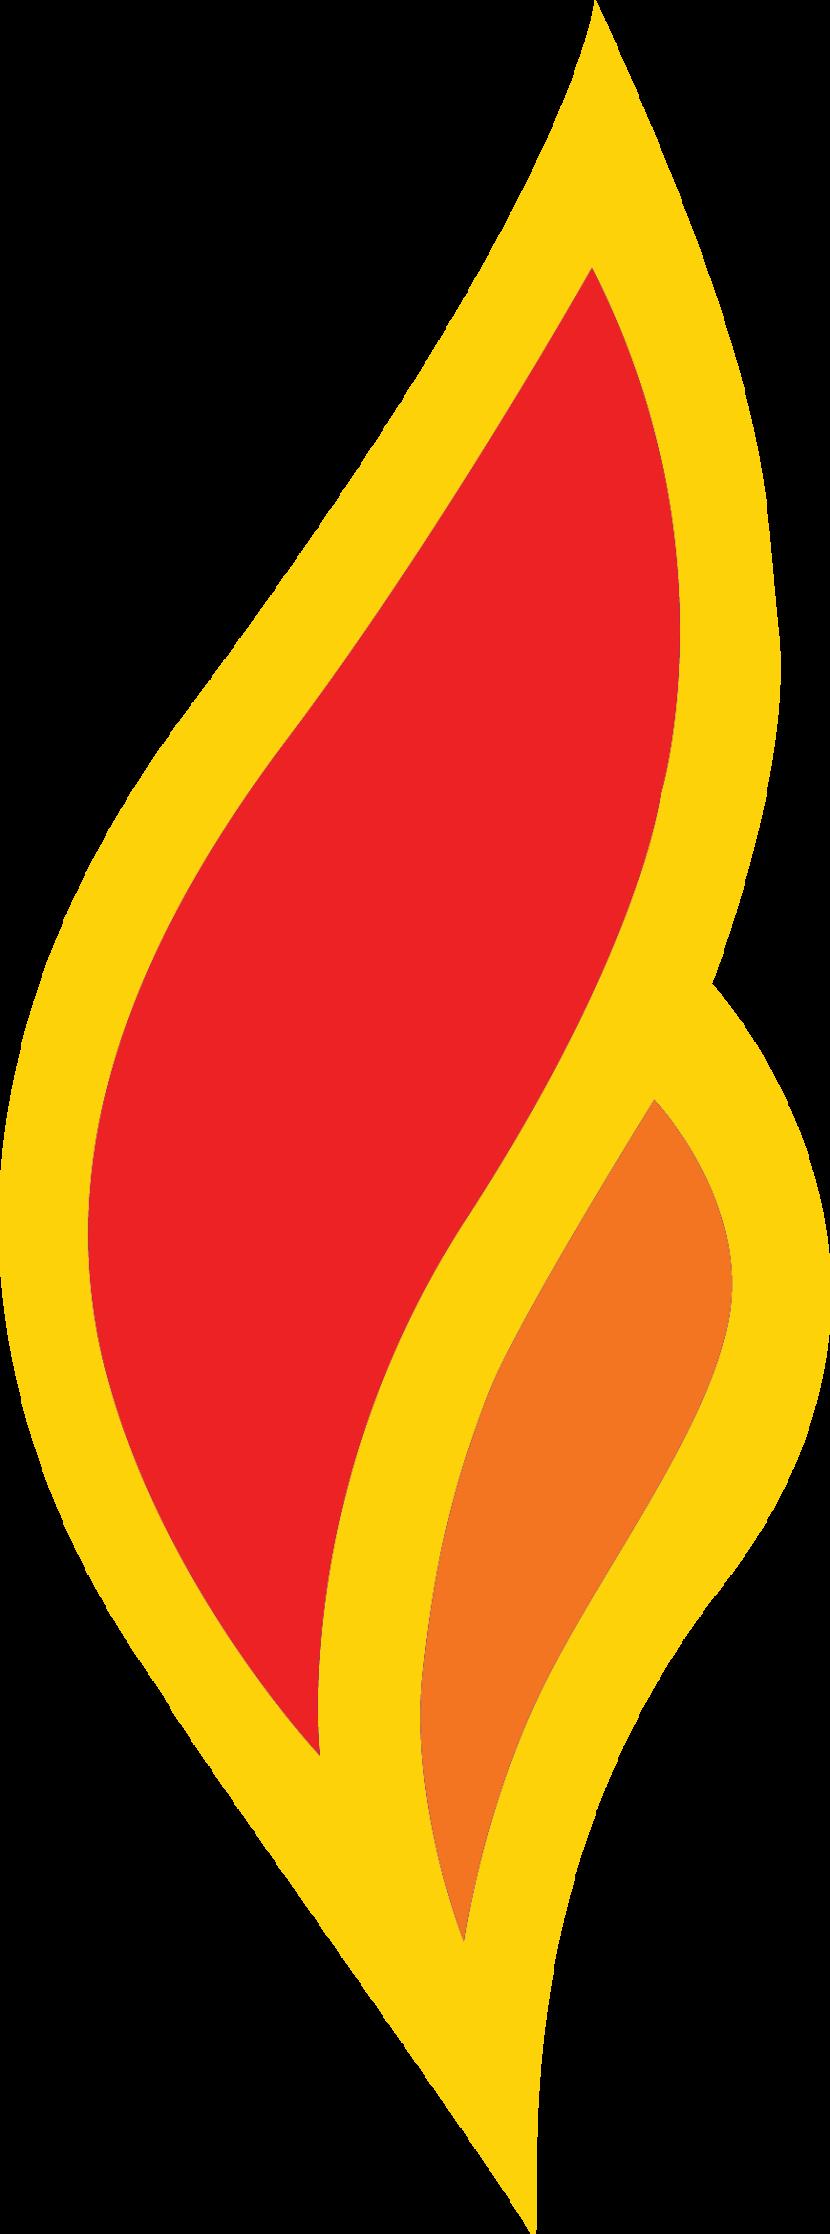 Flame clip art tumundografico